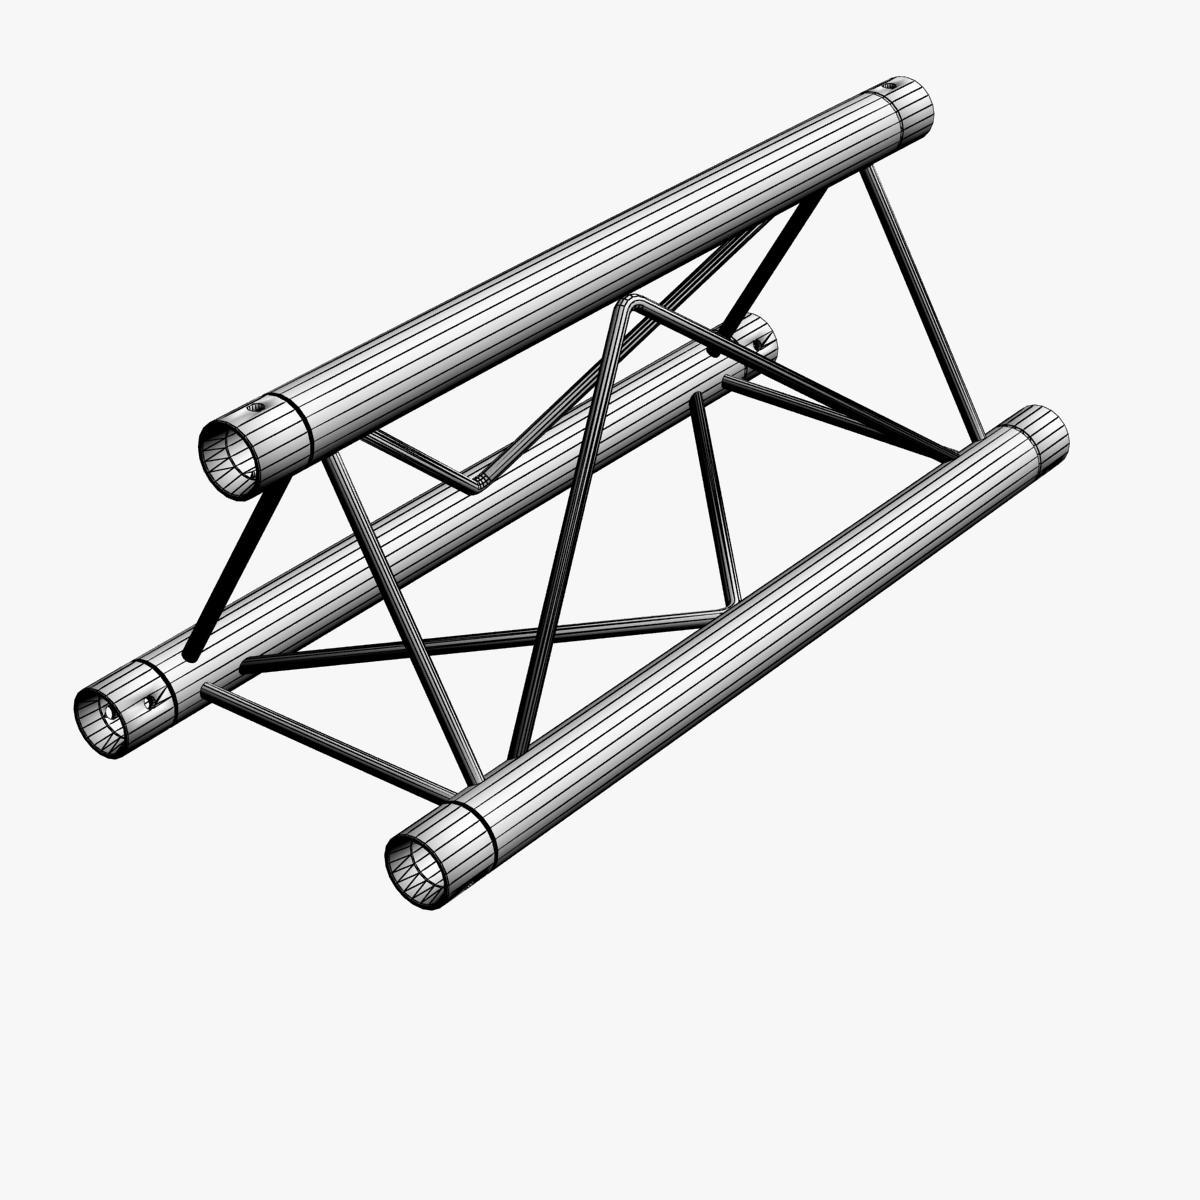 triangular trusses (collection 55 modular pieces) 3d model 3ds max dxf fbx c4d dae texture obj 216252